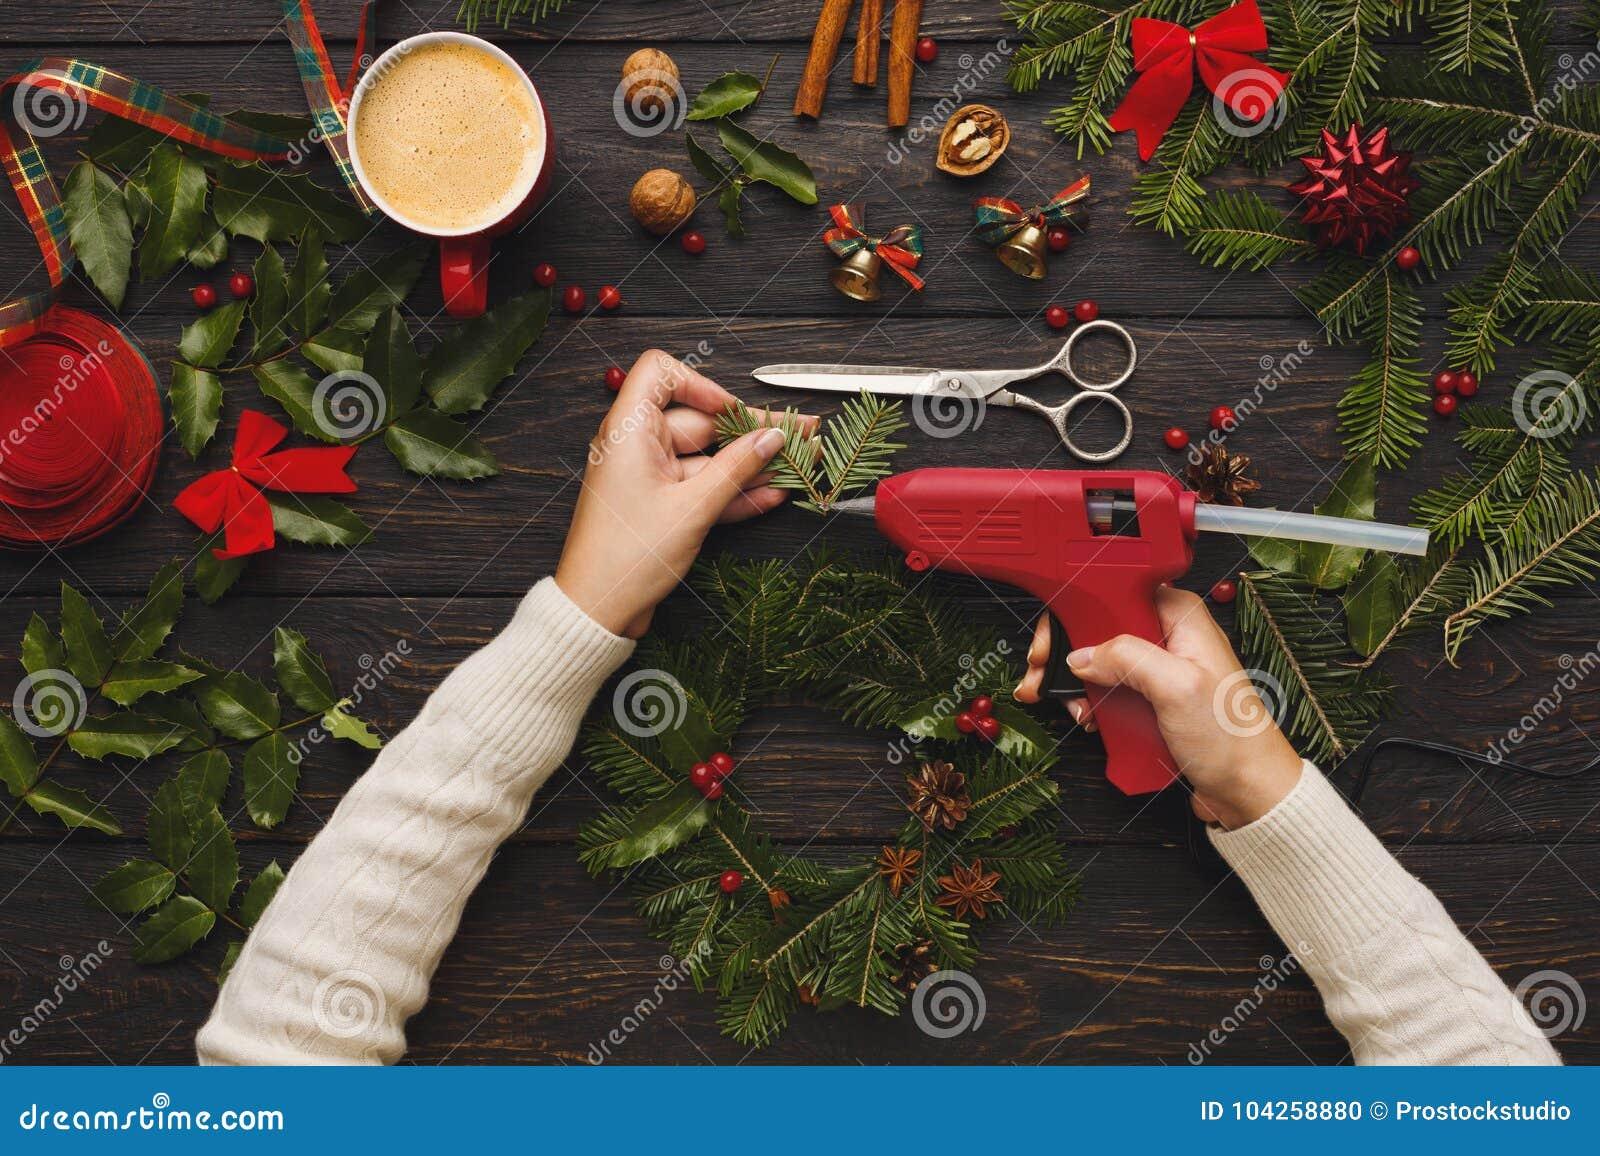 Prepare For Xmas Creative Craft Wreath Making Christmas Symbol